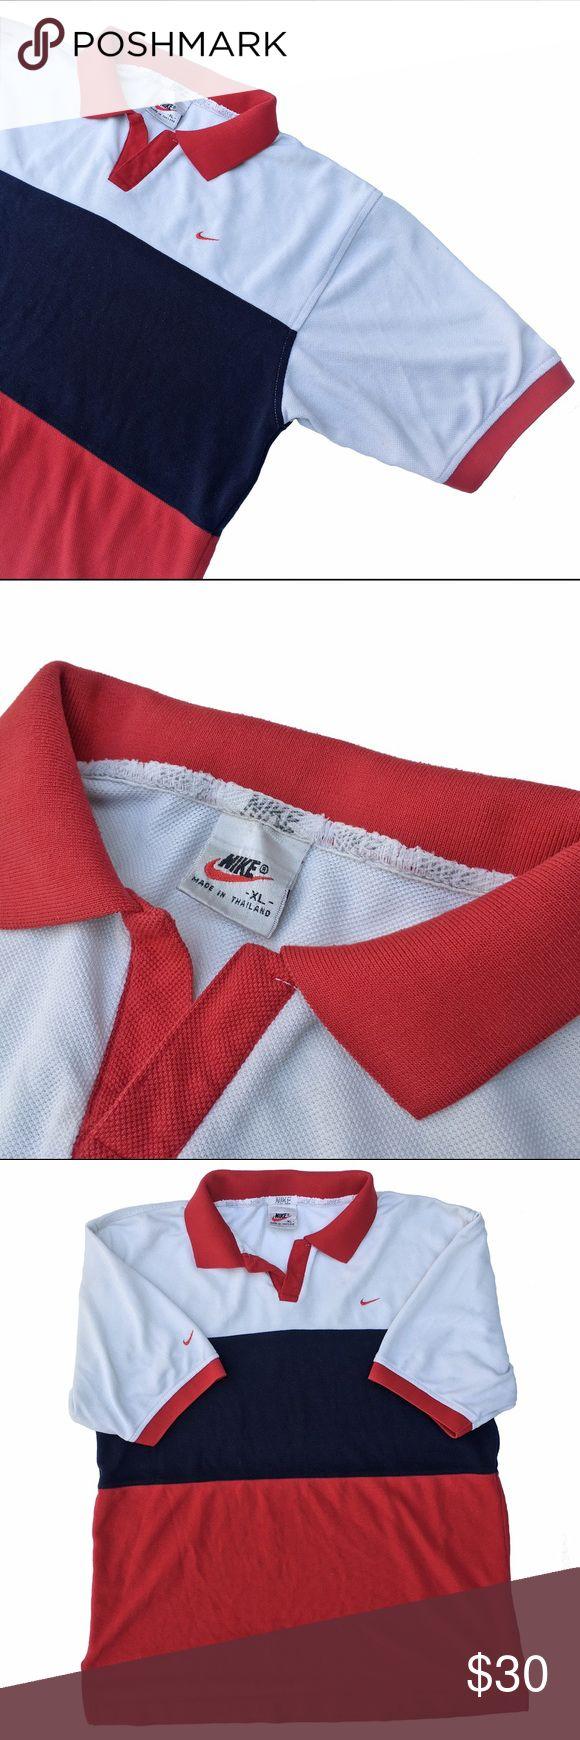 Vintage Nike polo shirt Vintage NIKE polo shirt. Size (XLarge) fits like a Size medium Nike Shirts Polos